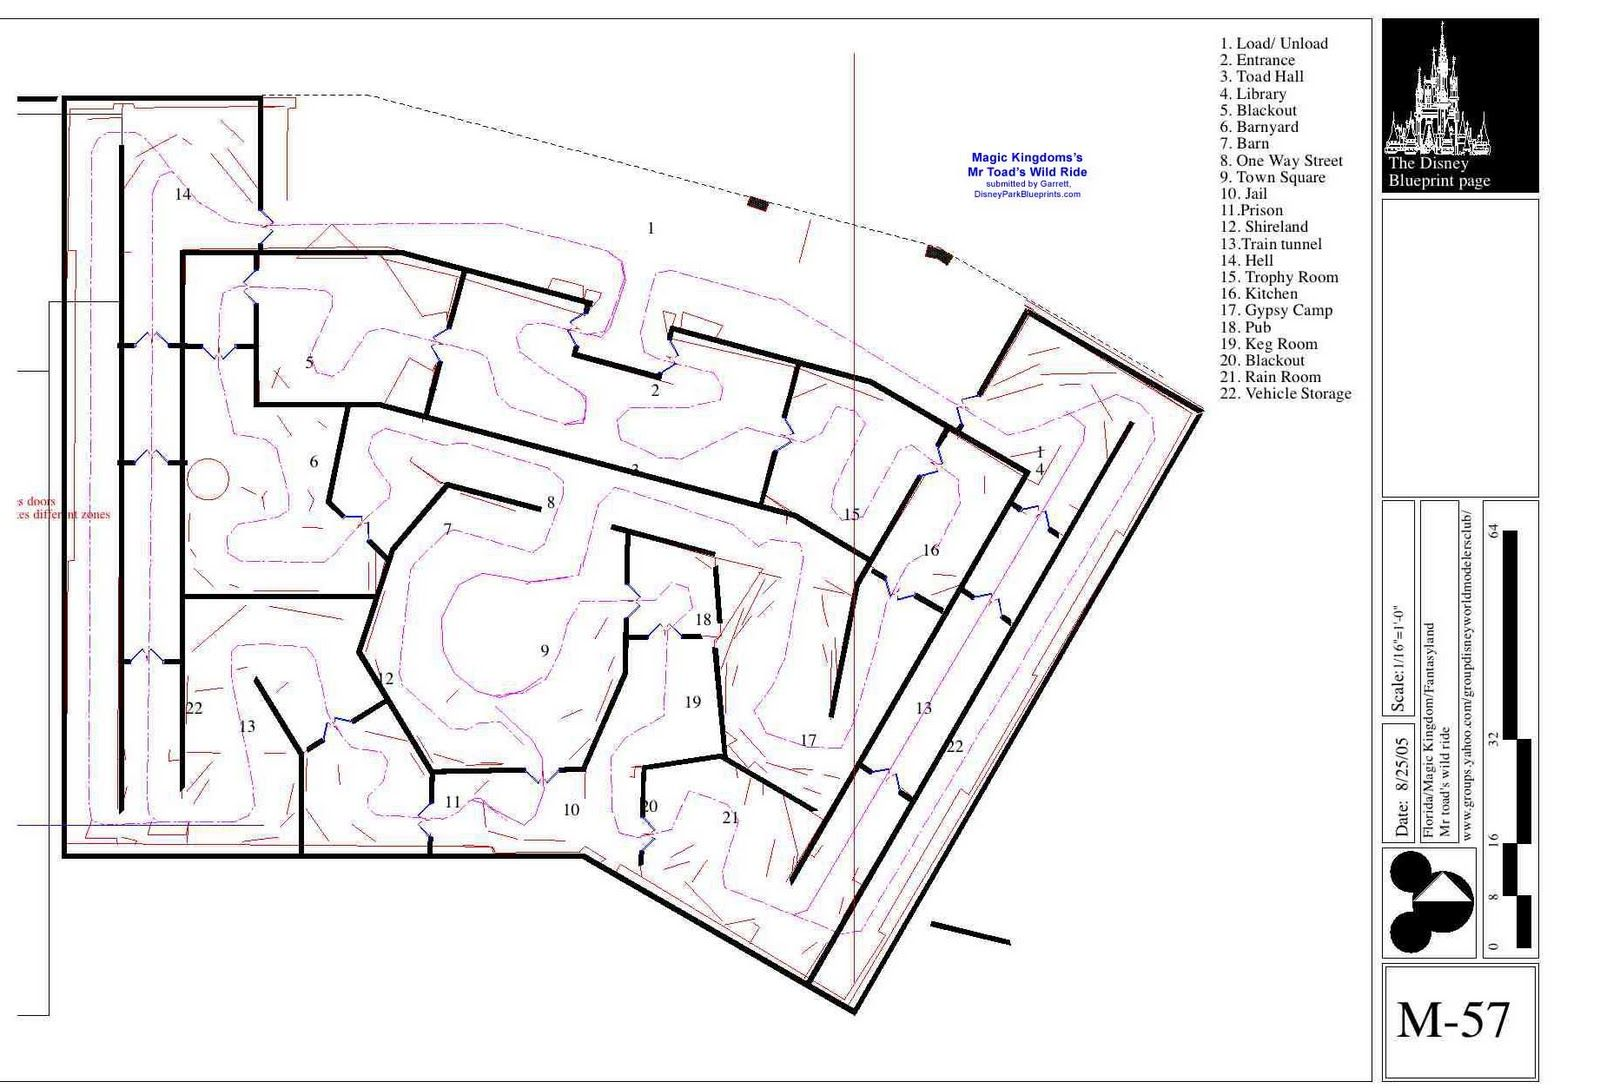 Disney park blueprints all blueprints all thats disney disney park blueprints all blueprints all thats disney pinterest disney parks malvernweather Choice Image